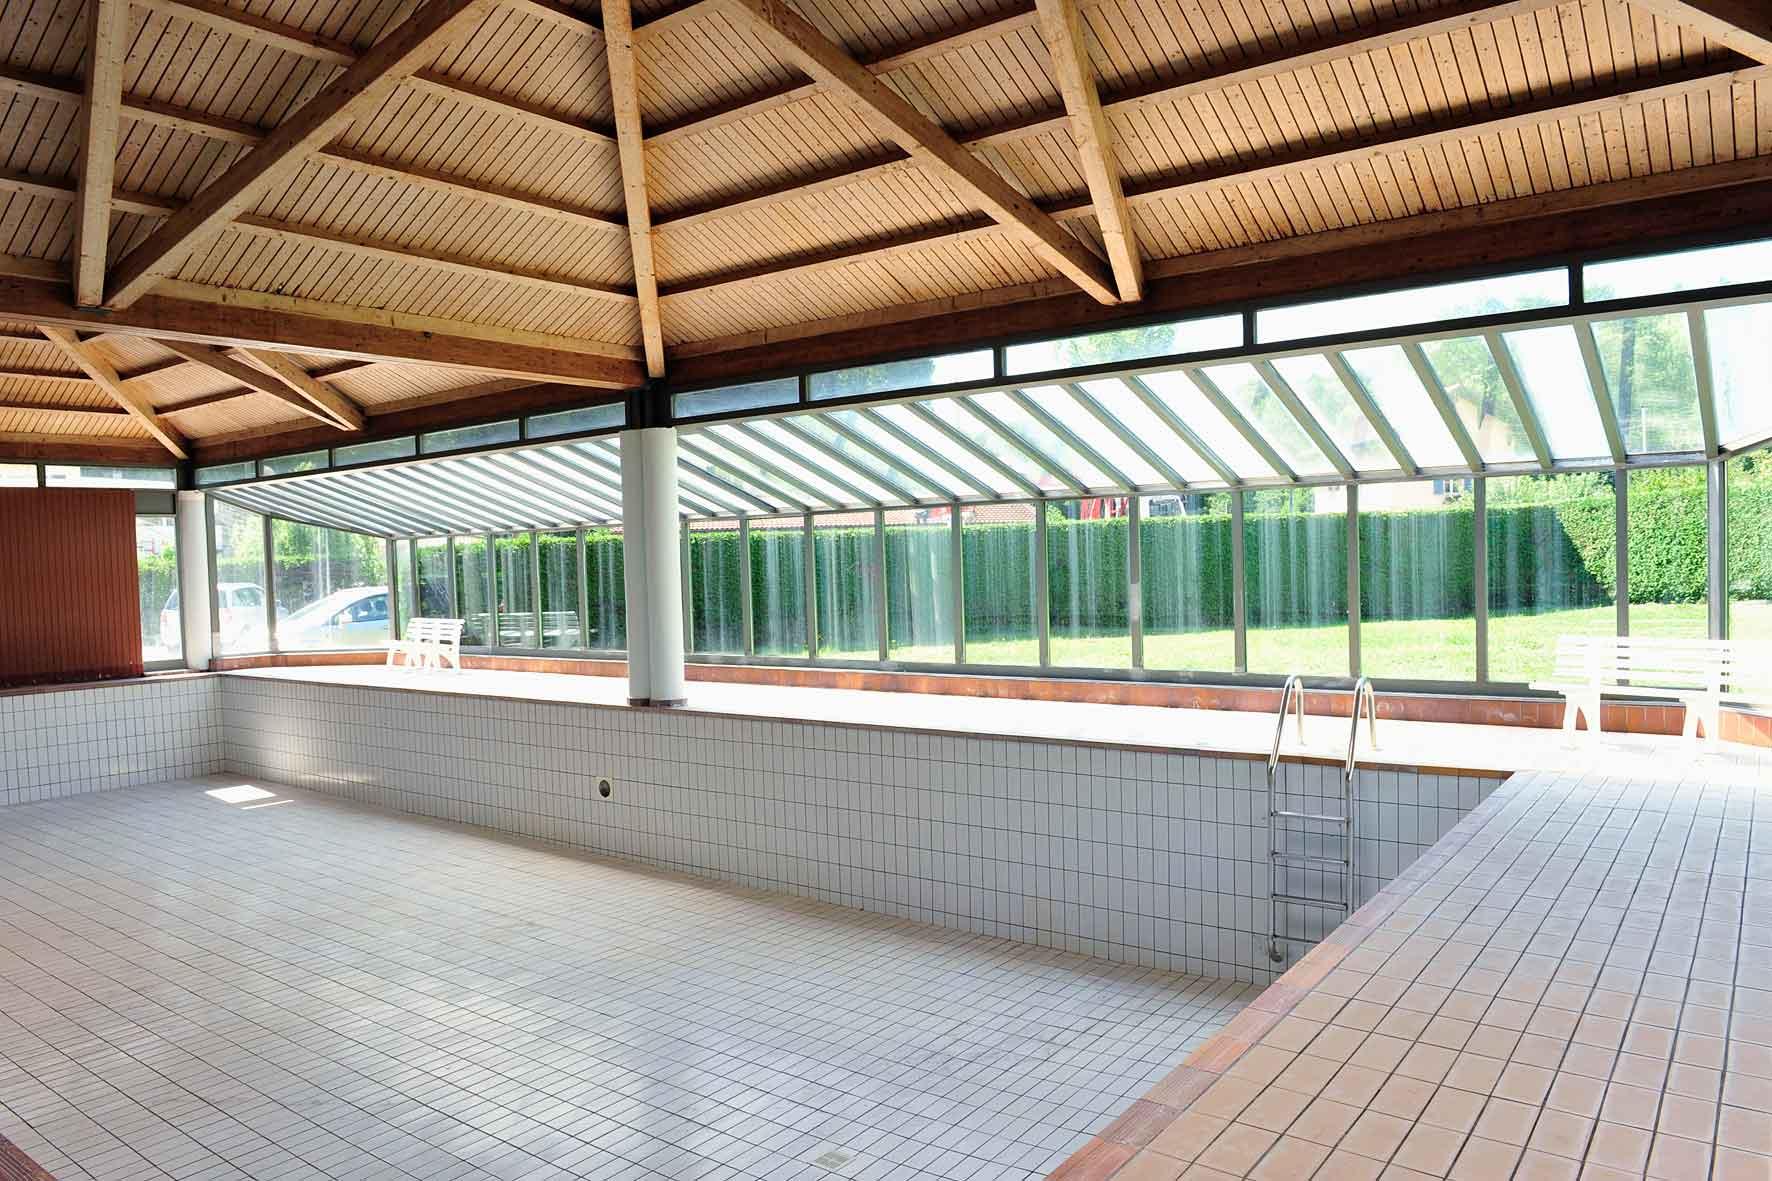 La piscine de valeyres restera vide la r gion for Centre sportif claude robillard piscine